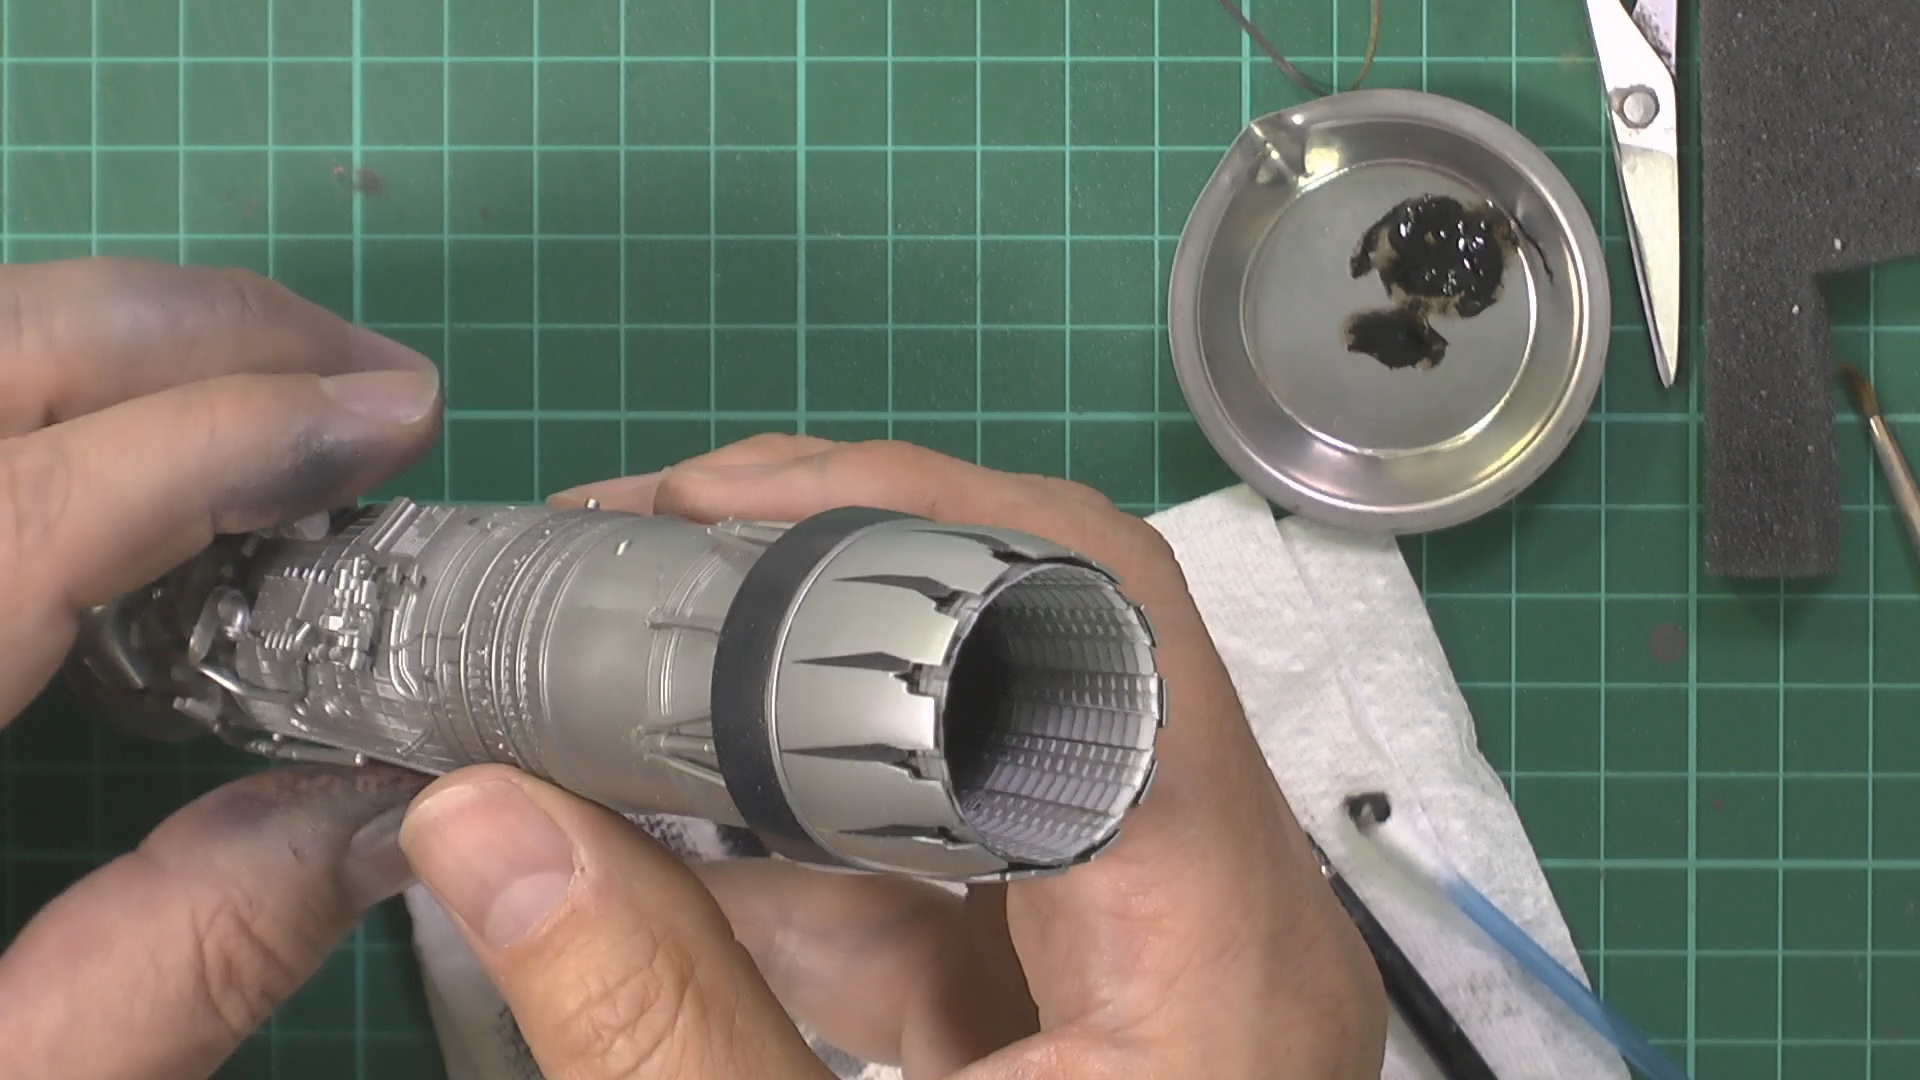 Tamiya F16 Part 2 Pic 2.jpg